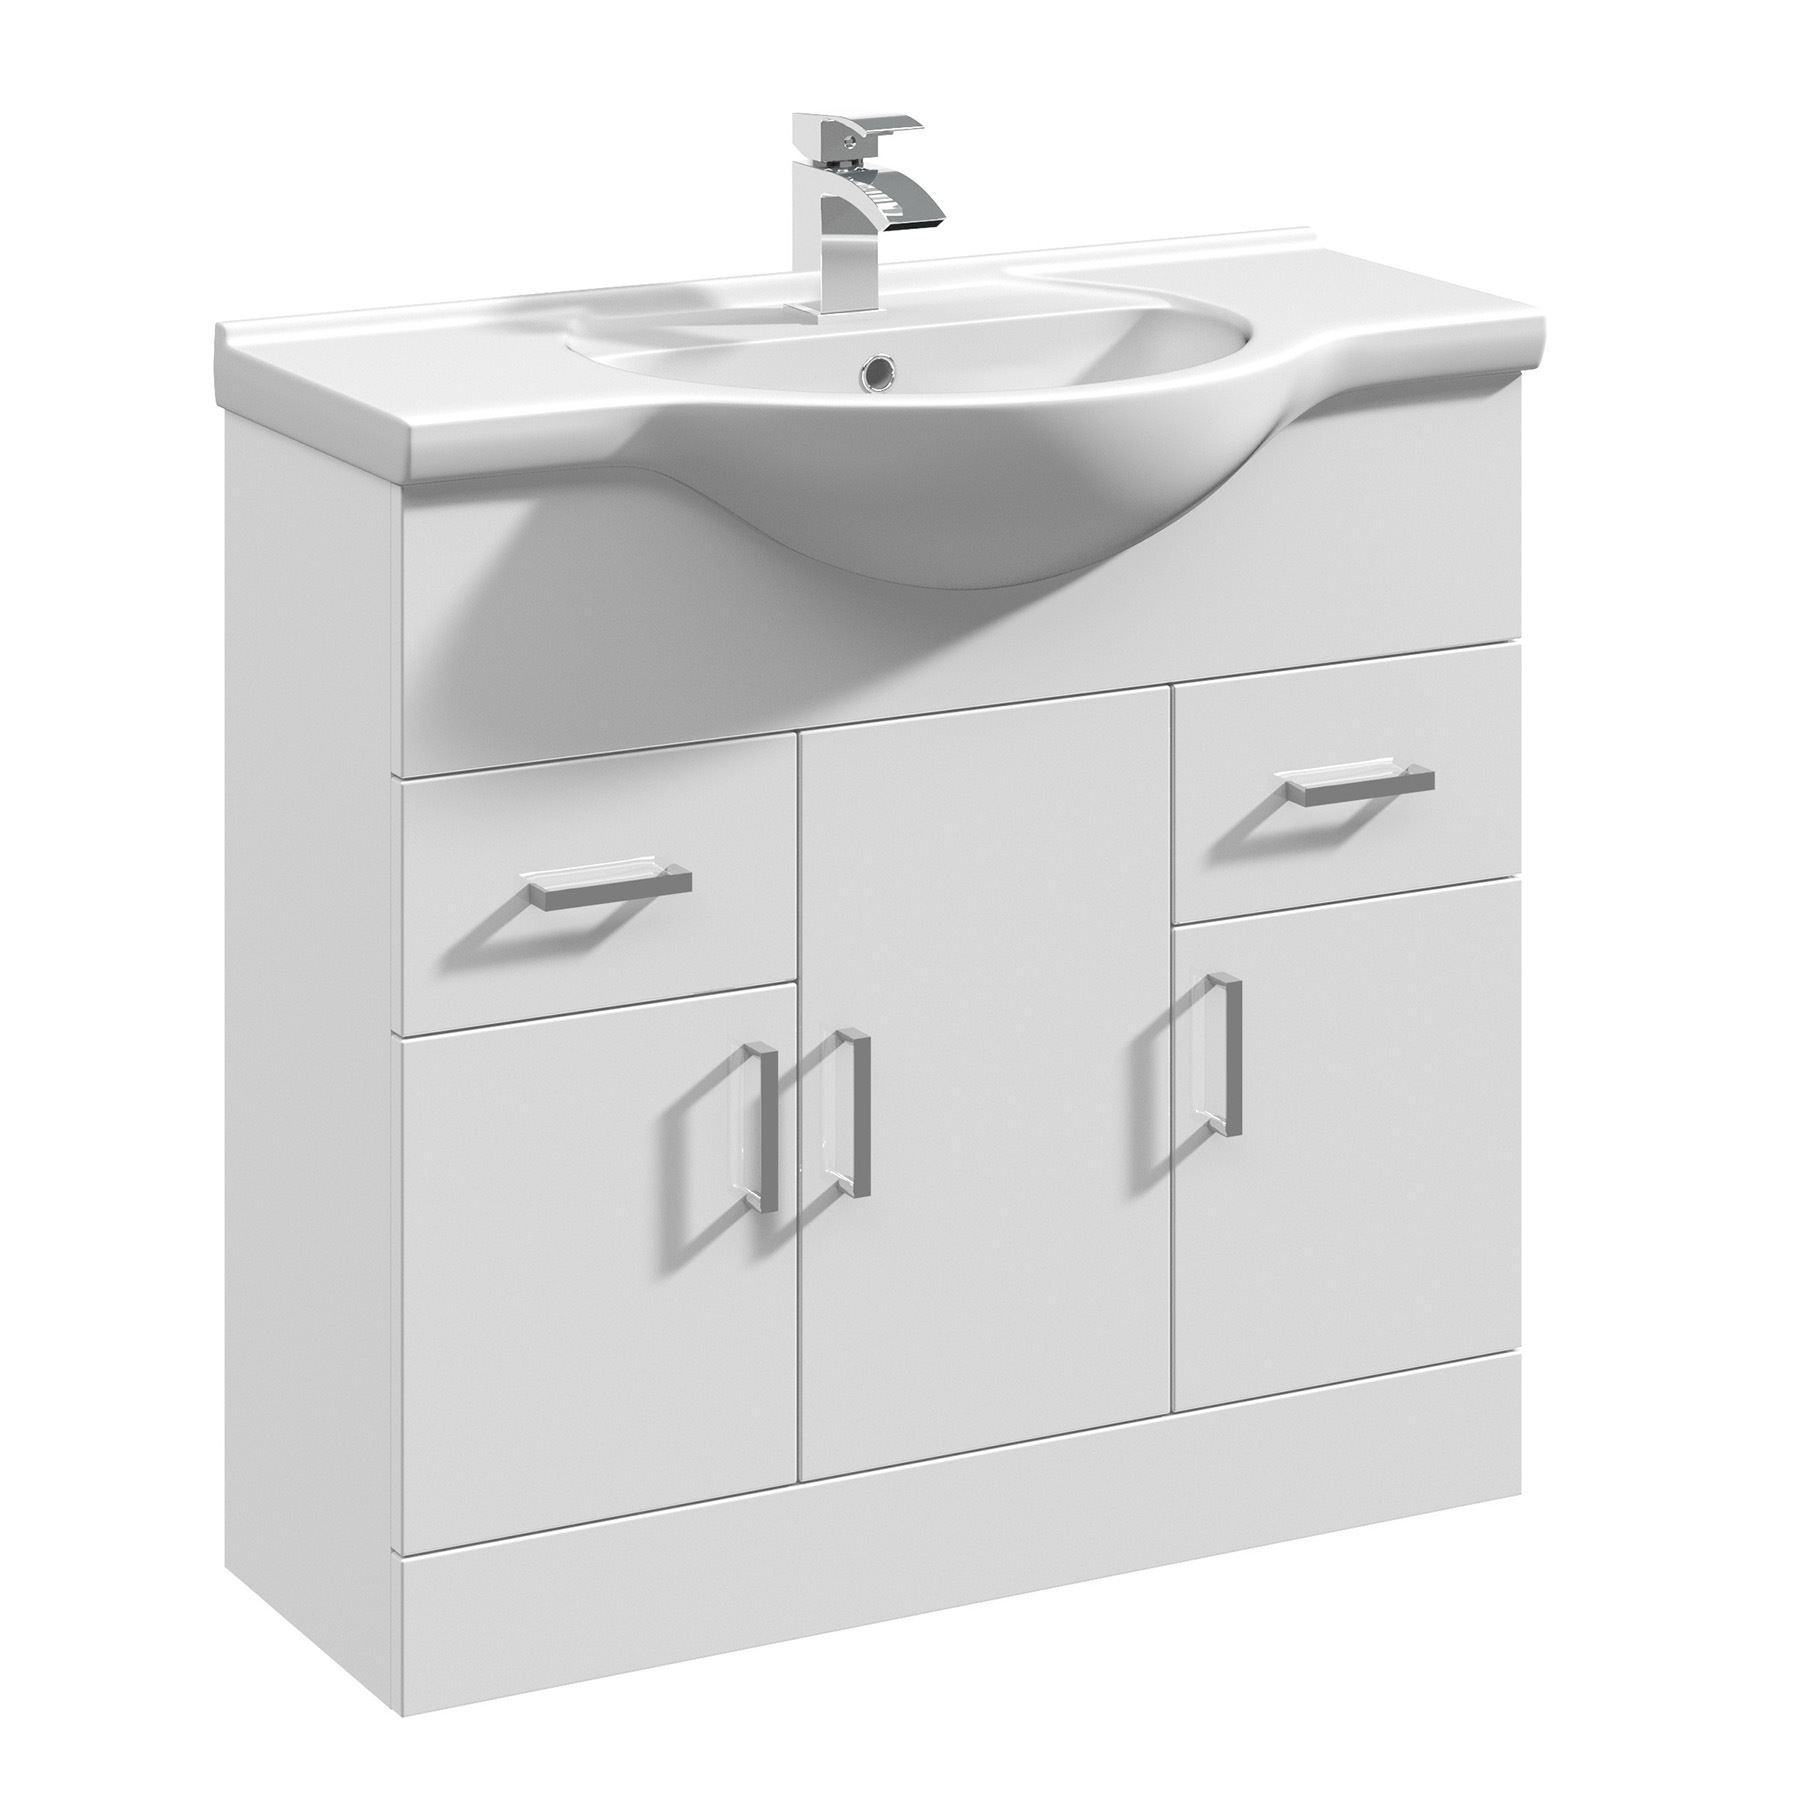 gloss white bathroom vanity unit cloakroom cabinet. Black Bedroom Furniture Sets. Home Design Ideas